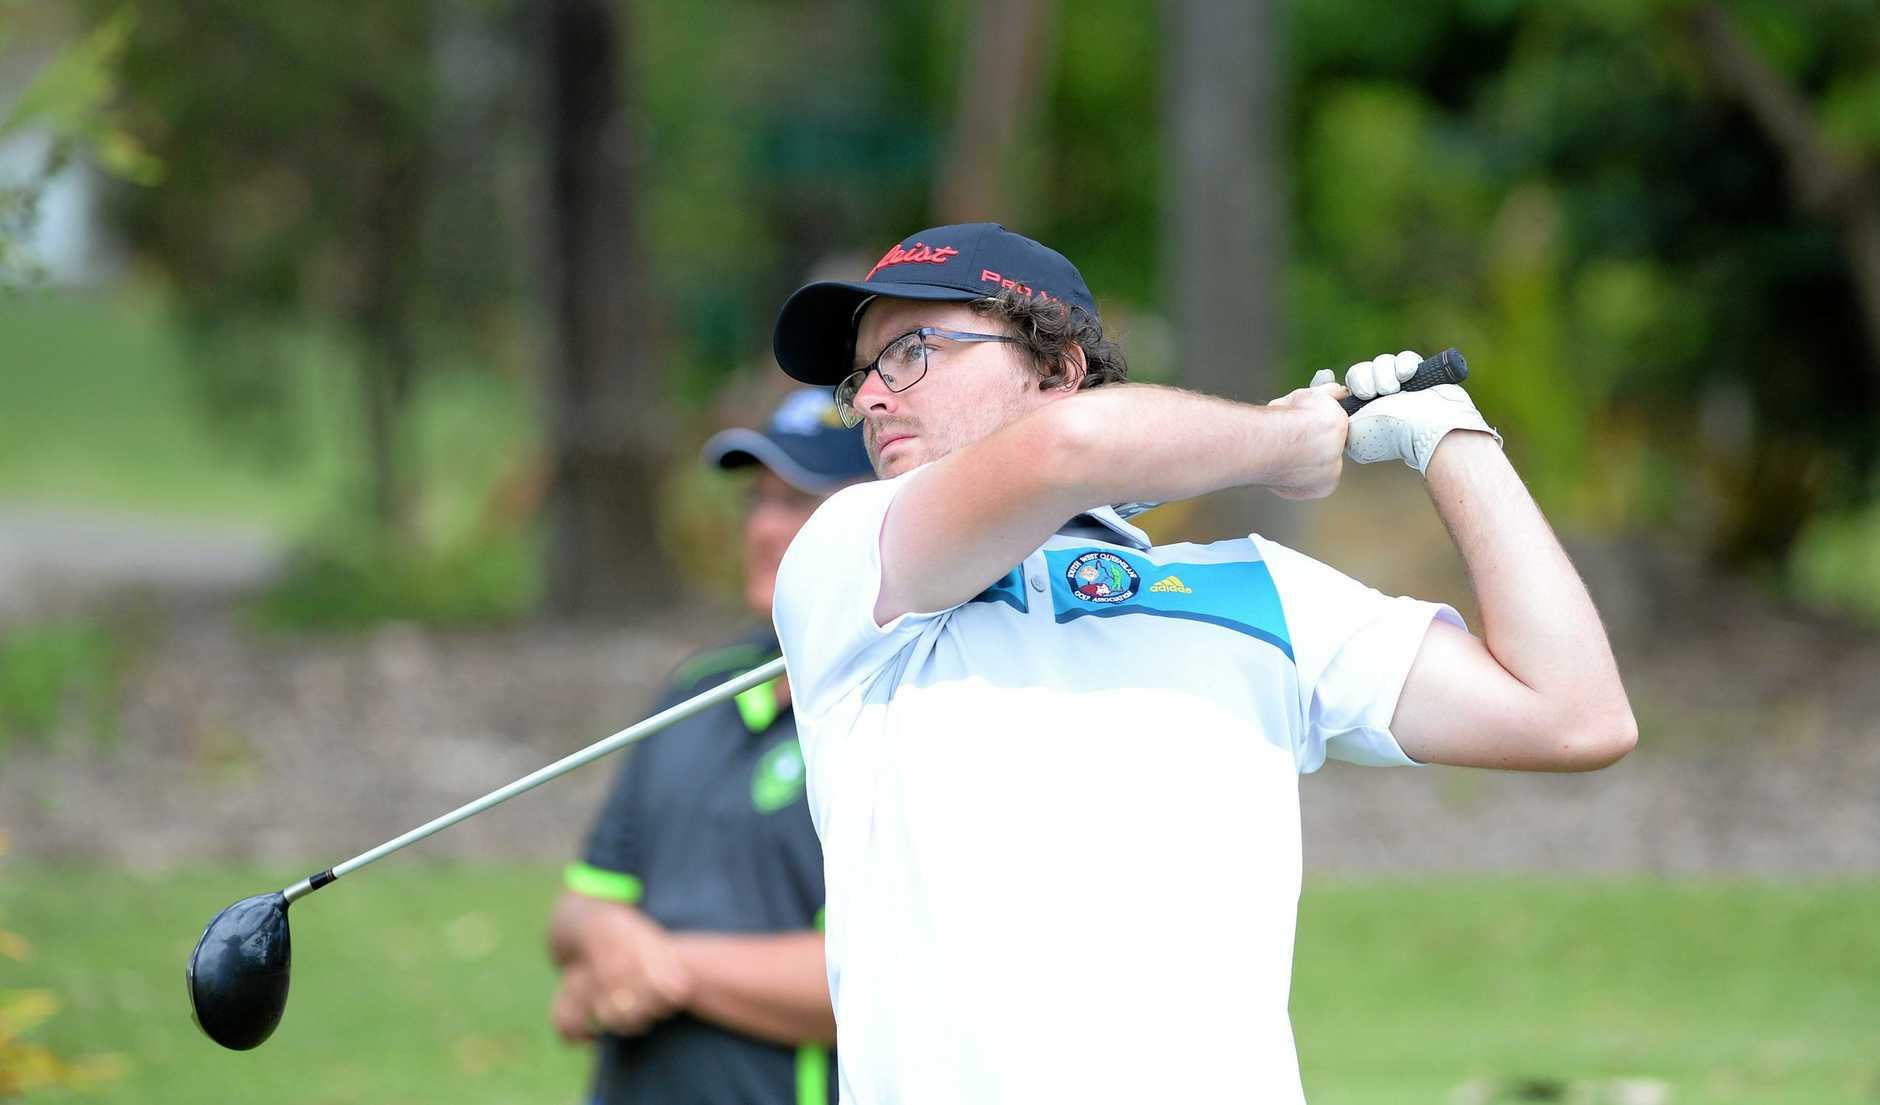 Sam Wade swings into action at the Rockhampton Golf Club.